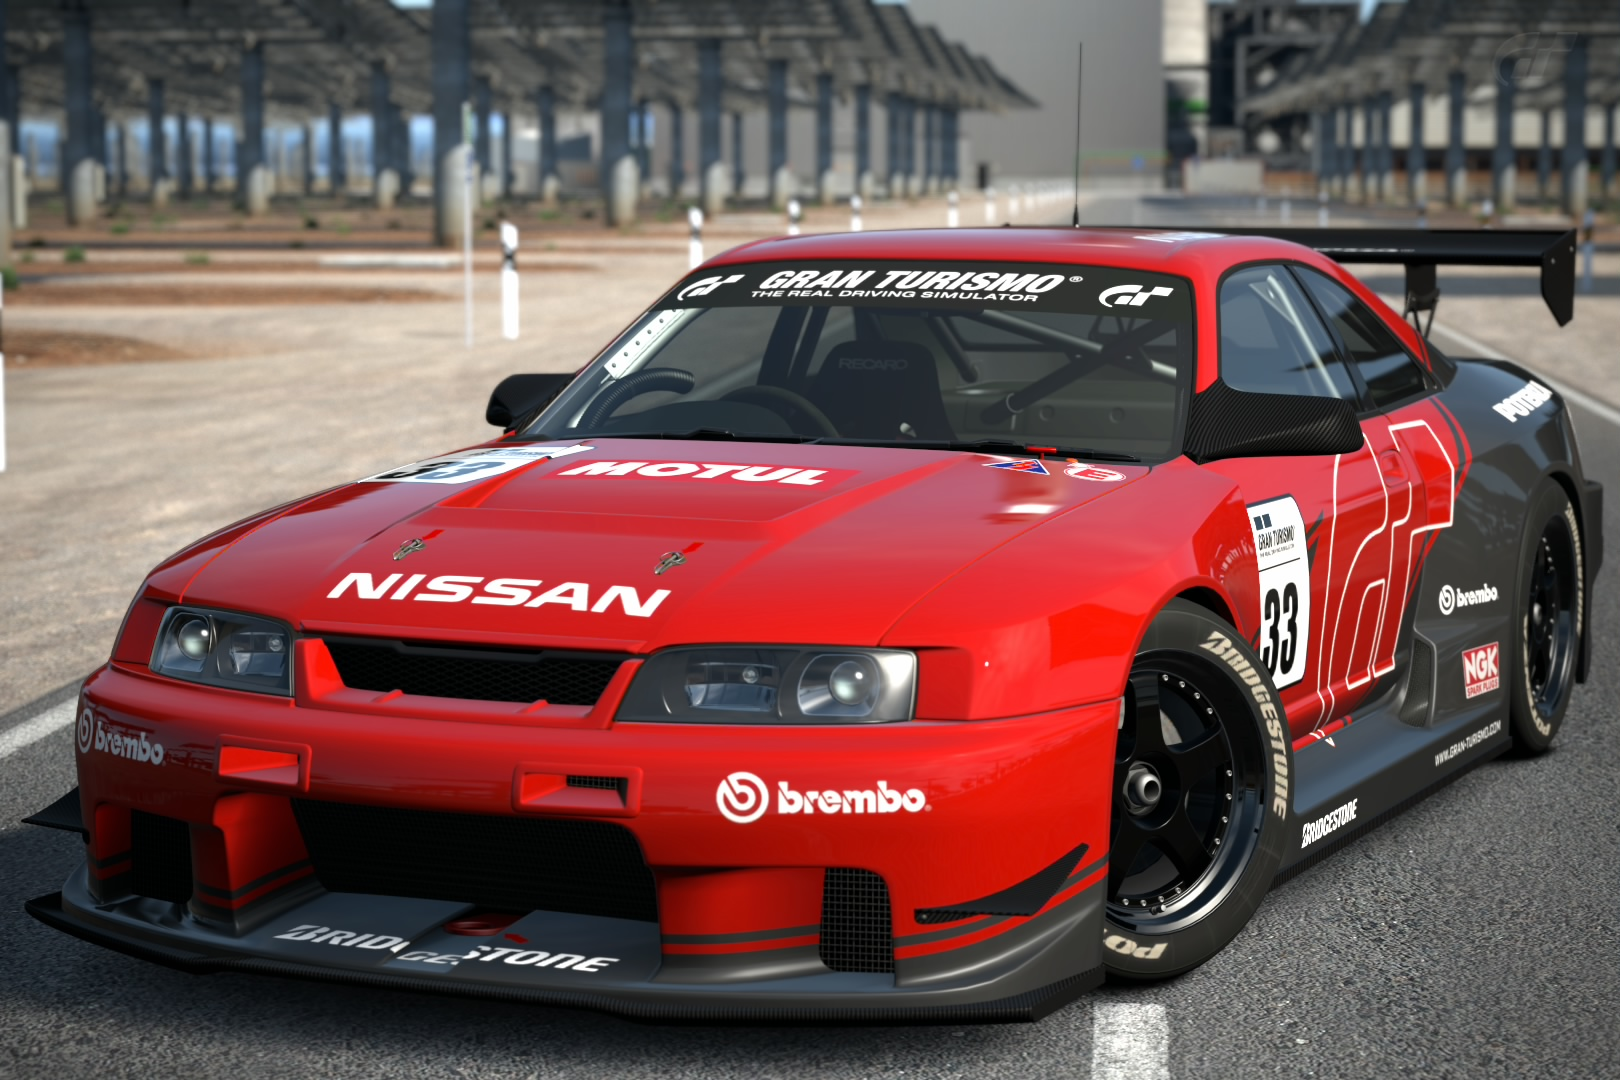 nissan skyline gt r r33 touring car gran turismo wiki fandom